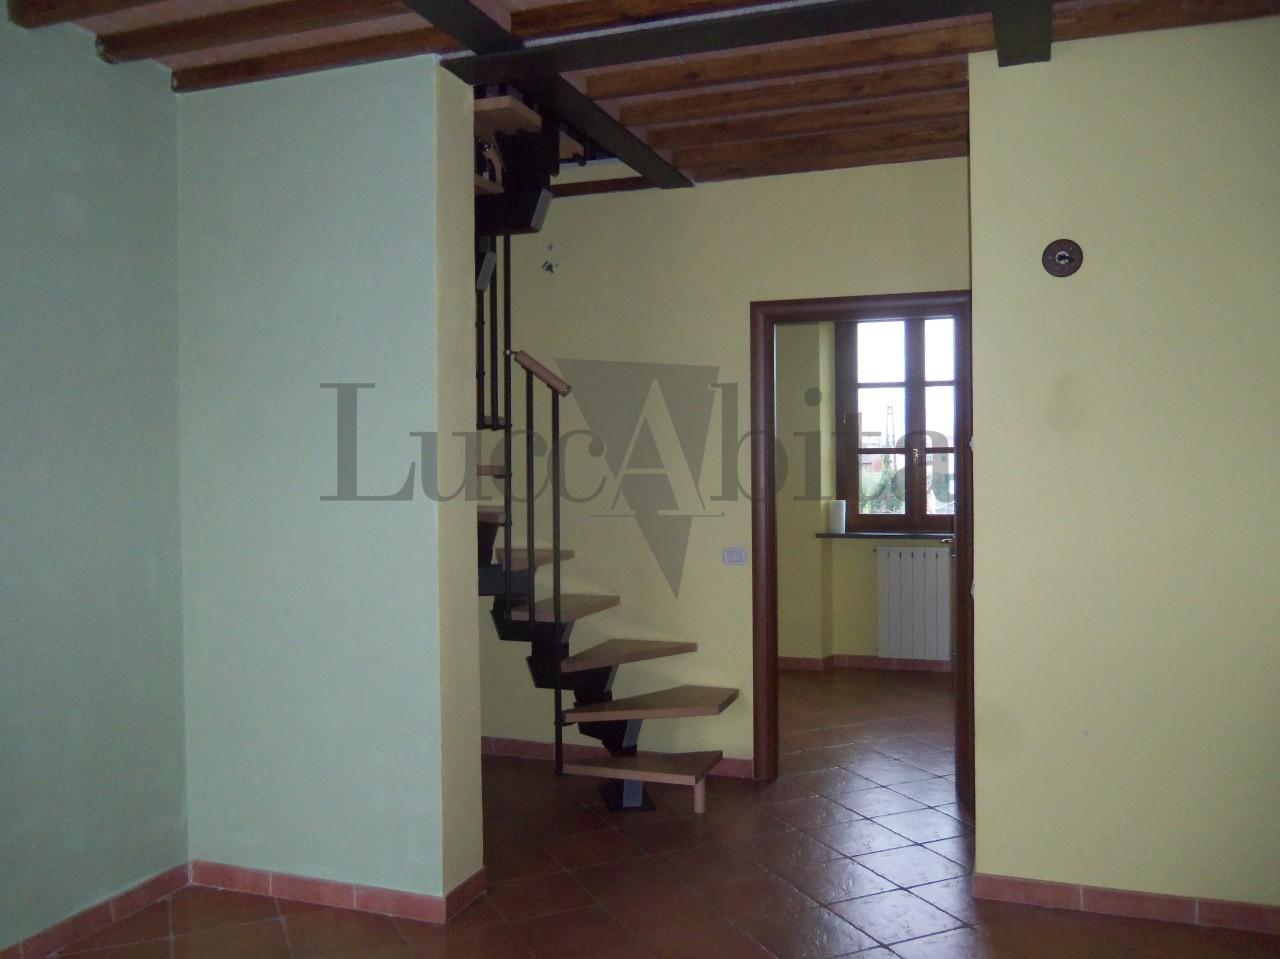 Vano Lavanderia In Bagno : Luccabita s.r.l